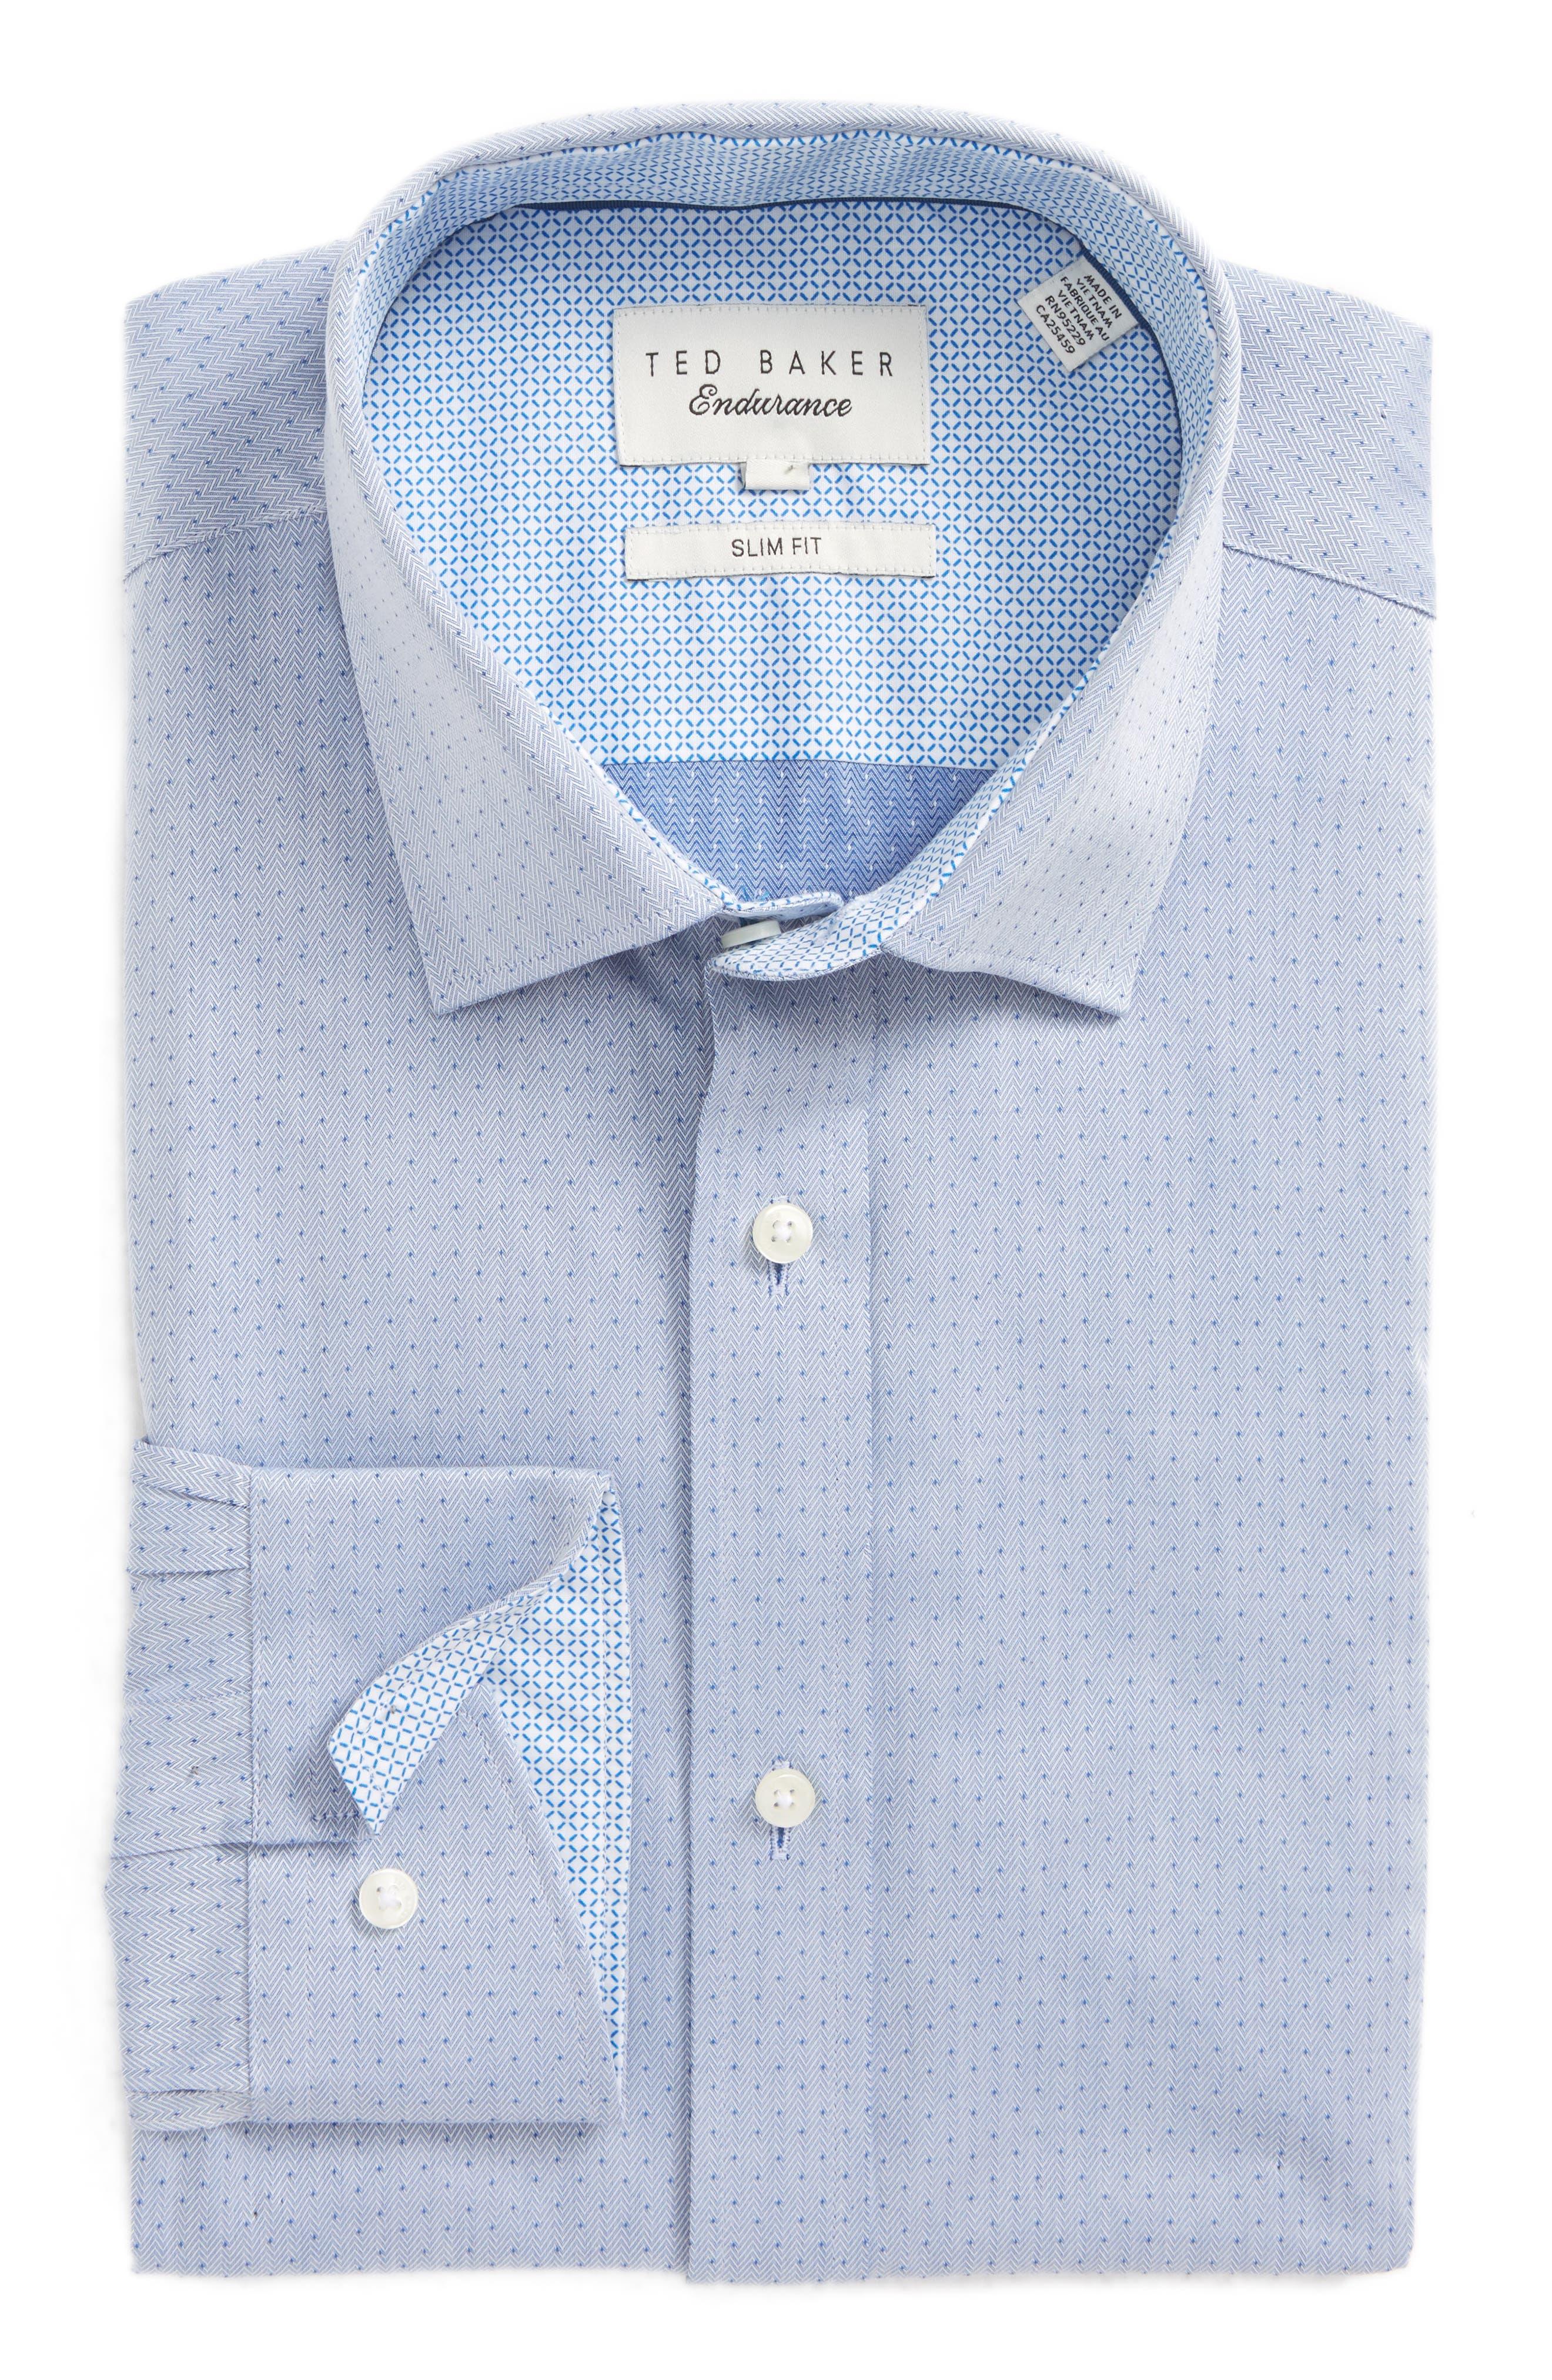 Boxli Trim Fit Herringbone Dress Shirt,                         Main,                         color, Blue